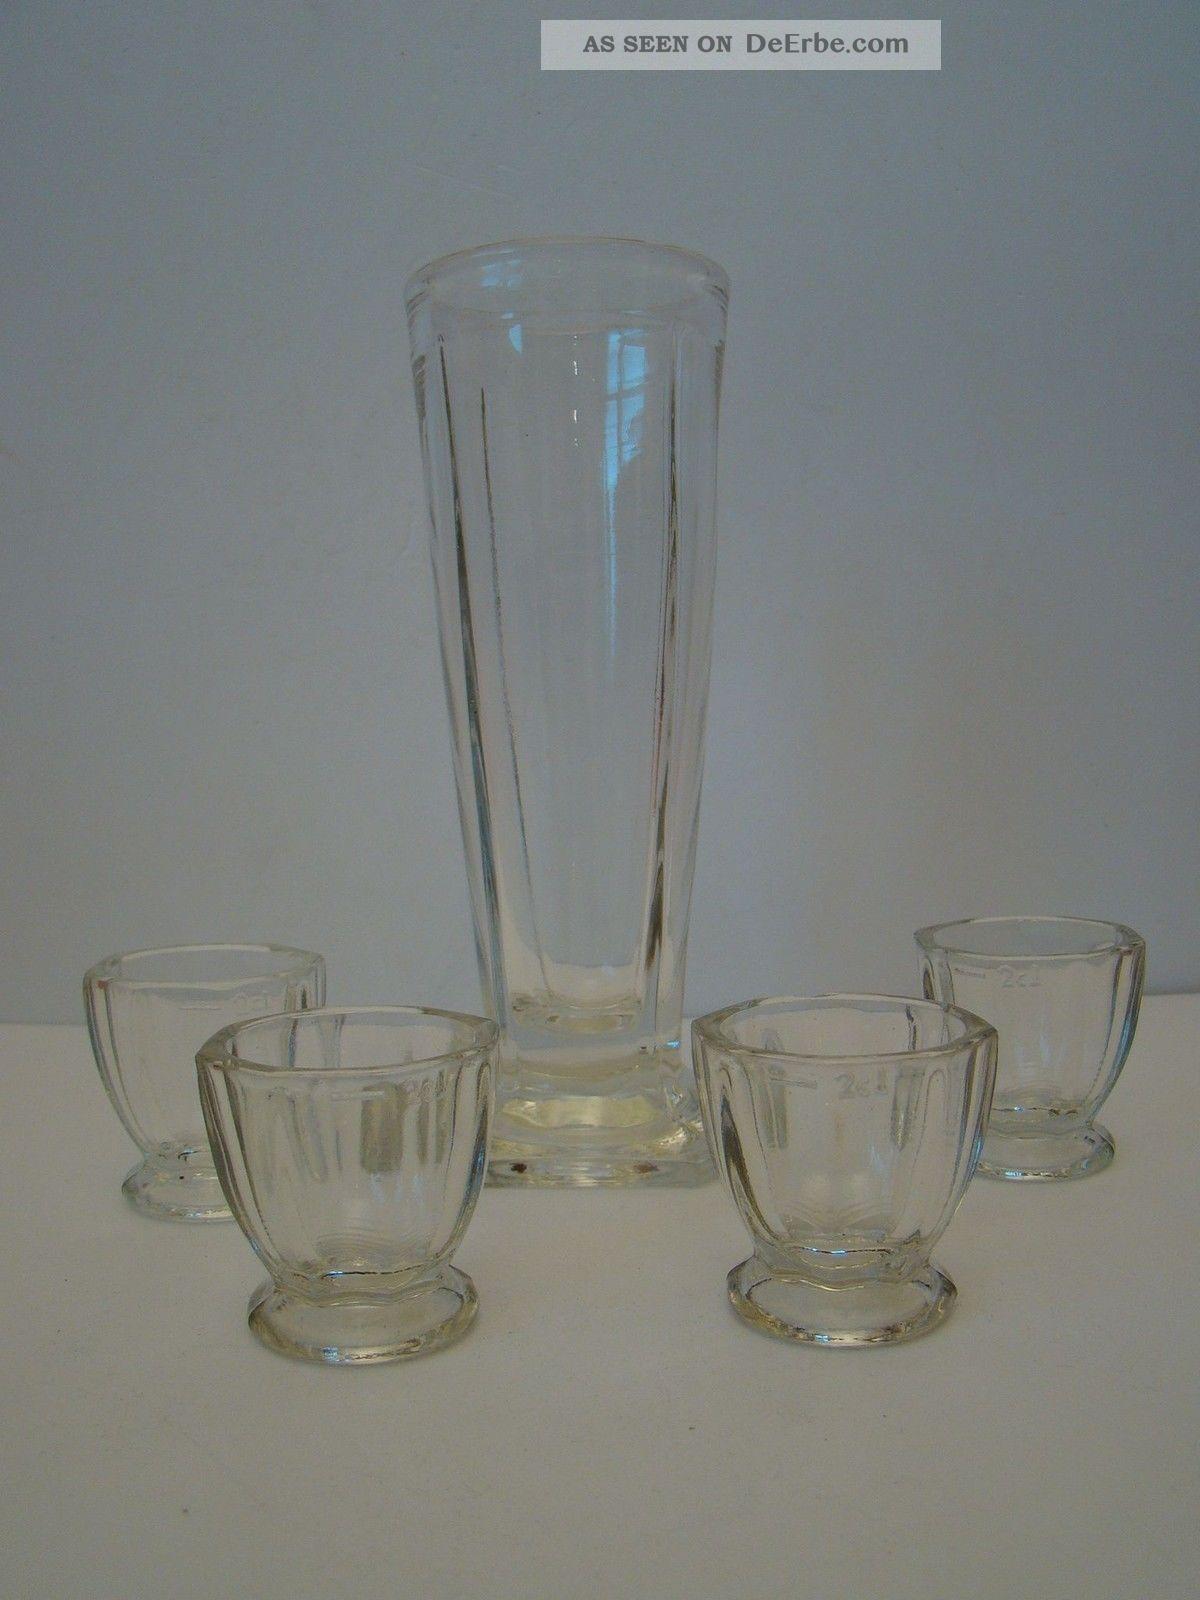 4 Antike Schnapsgläser Mit Karaffe Glas & Kristall Bild